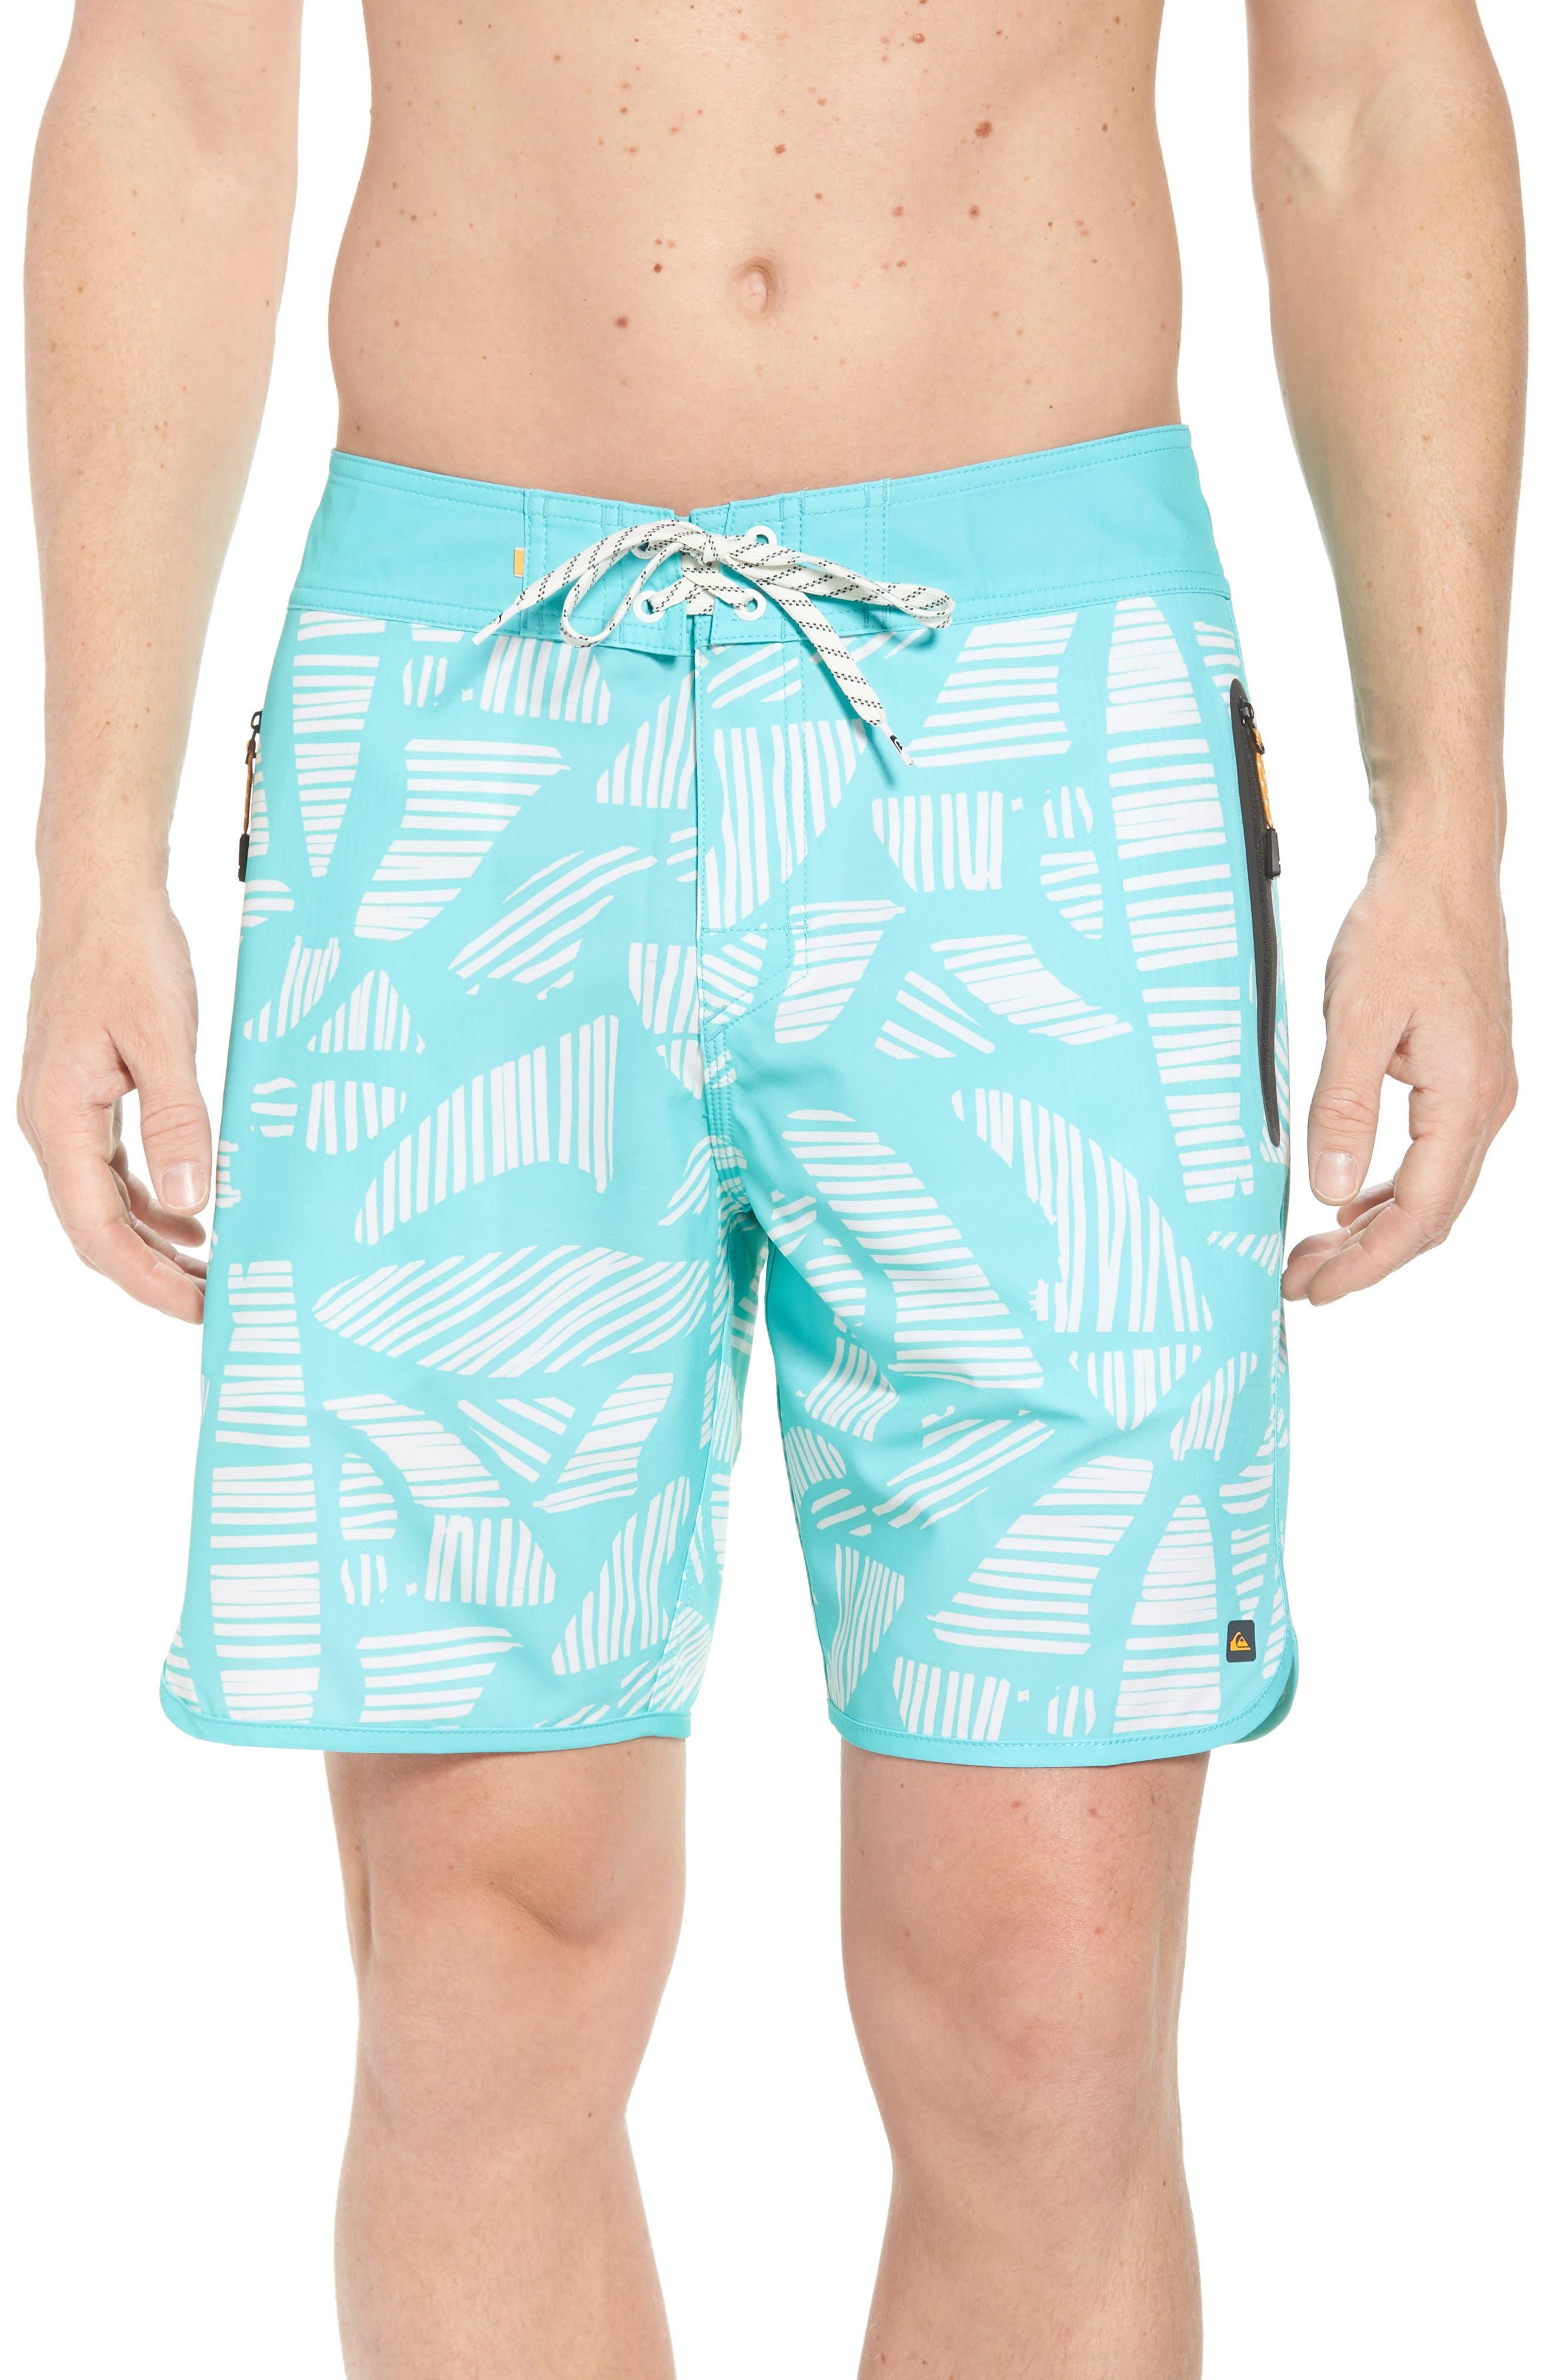 Odysea Board Shorts,                         Main,                         color, BLUE RADIANCE